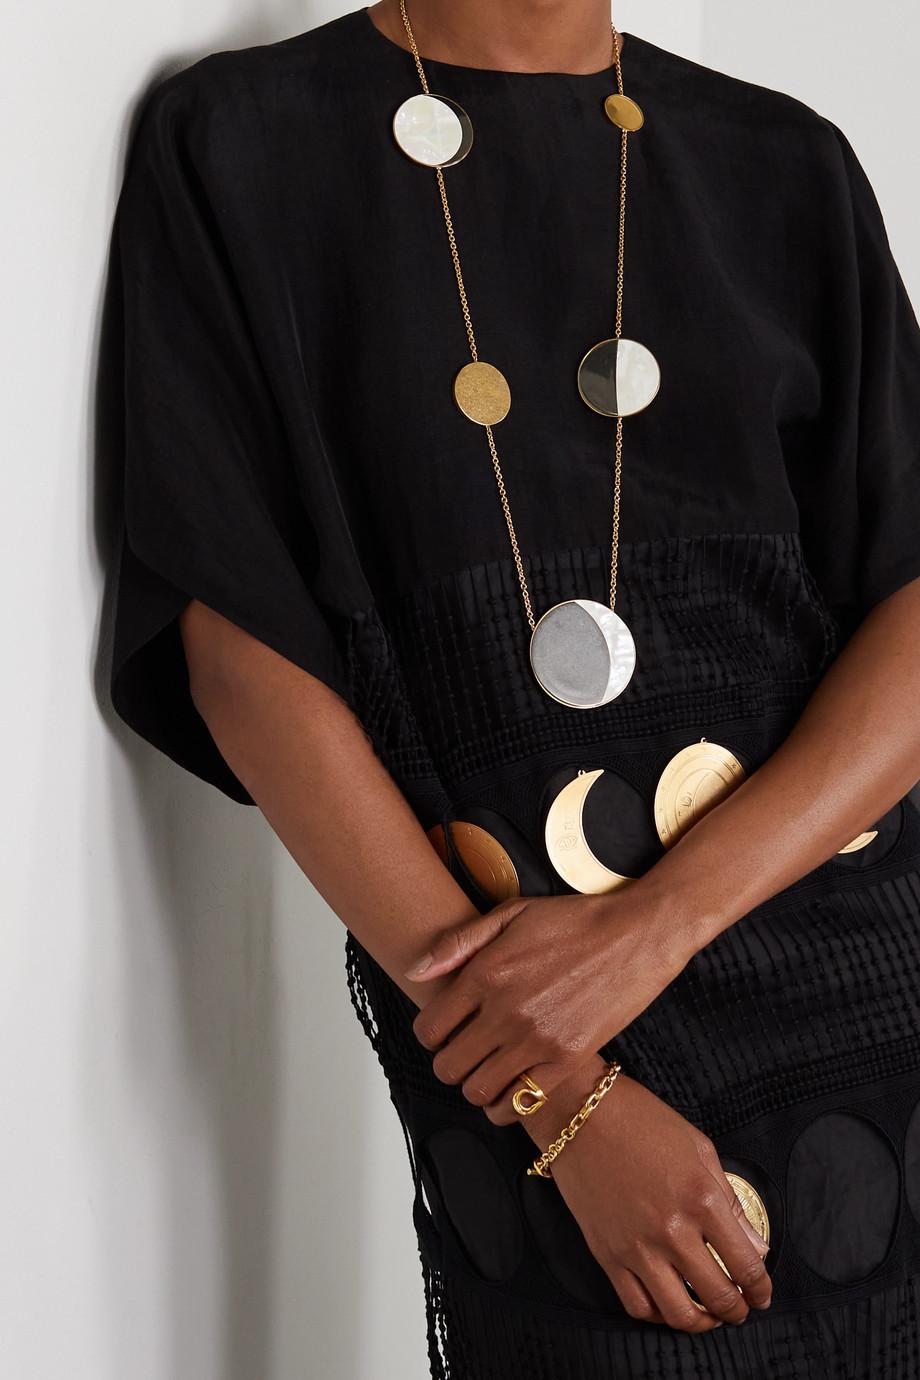 Loewe + Paula's Ibiza Ellipse gold-tone, acrylic and mother-of-pearl necklace